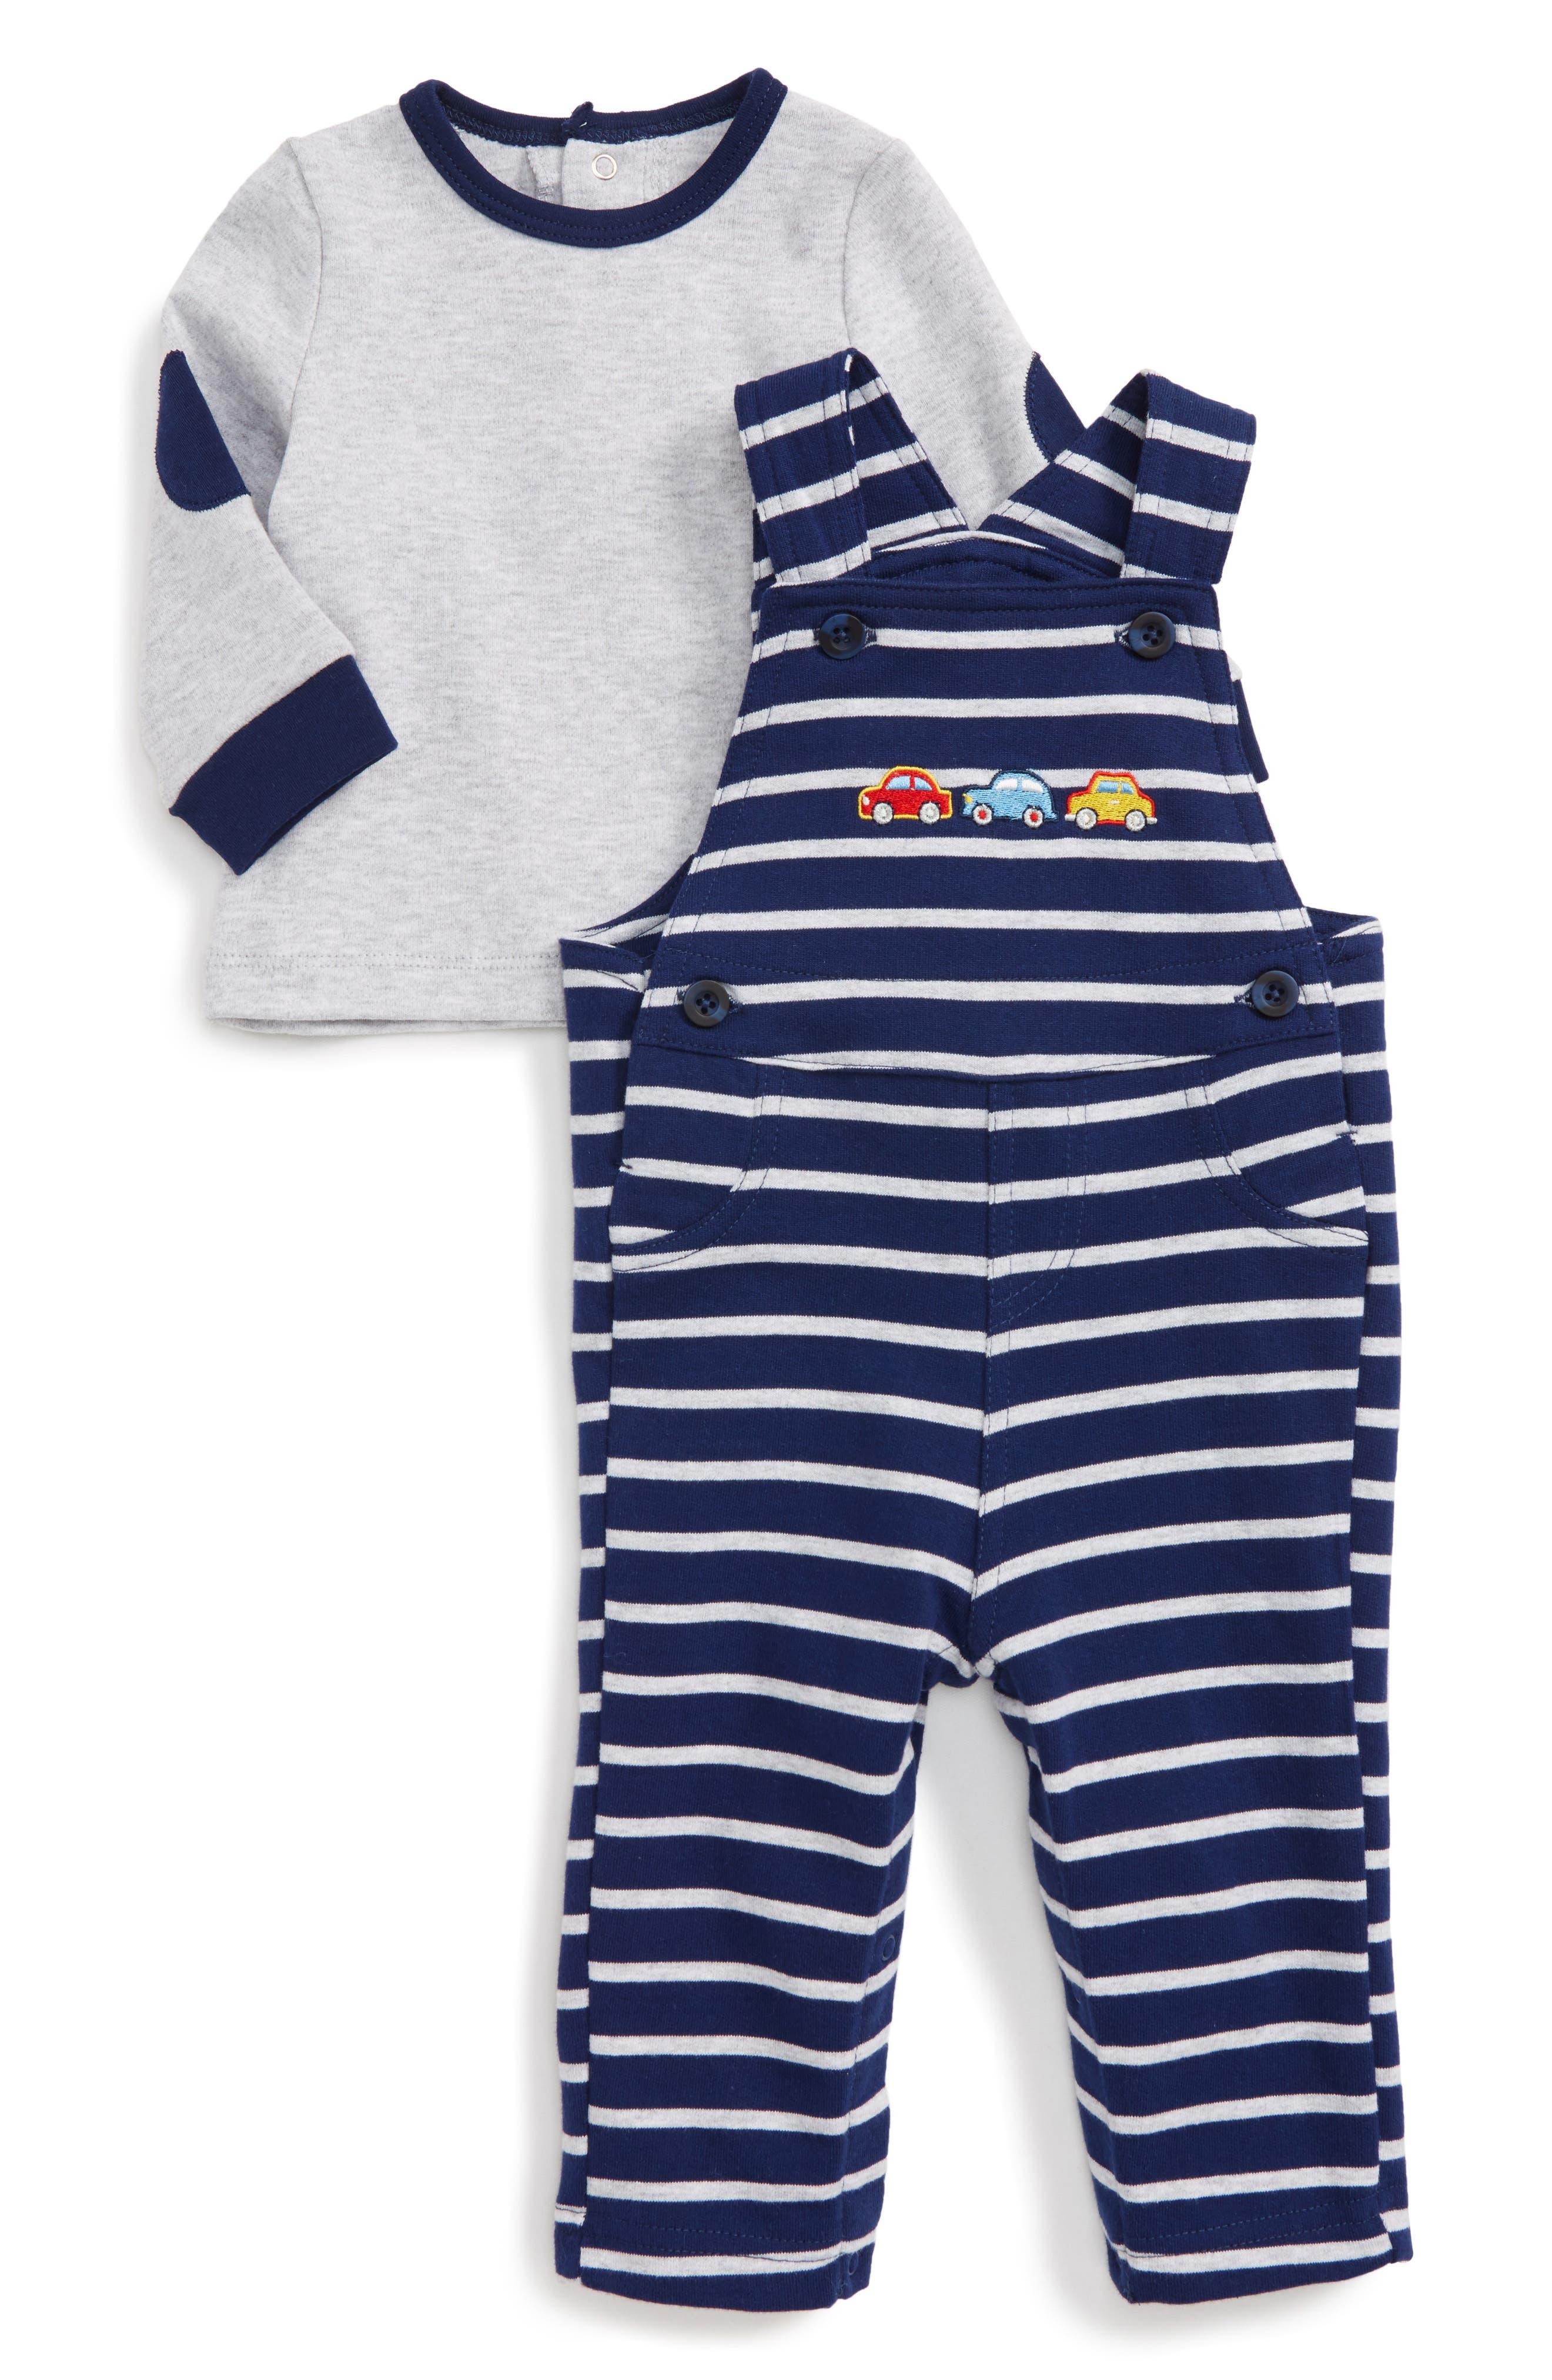 Alternate Image 1 Selected - Little Me Car T-Shirt & Overalls Set (Baby Boys)